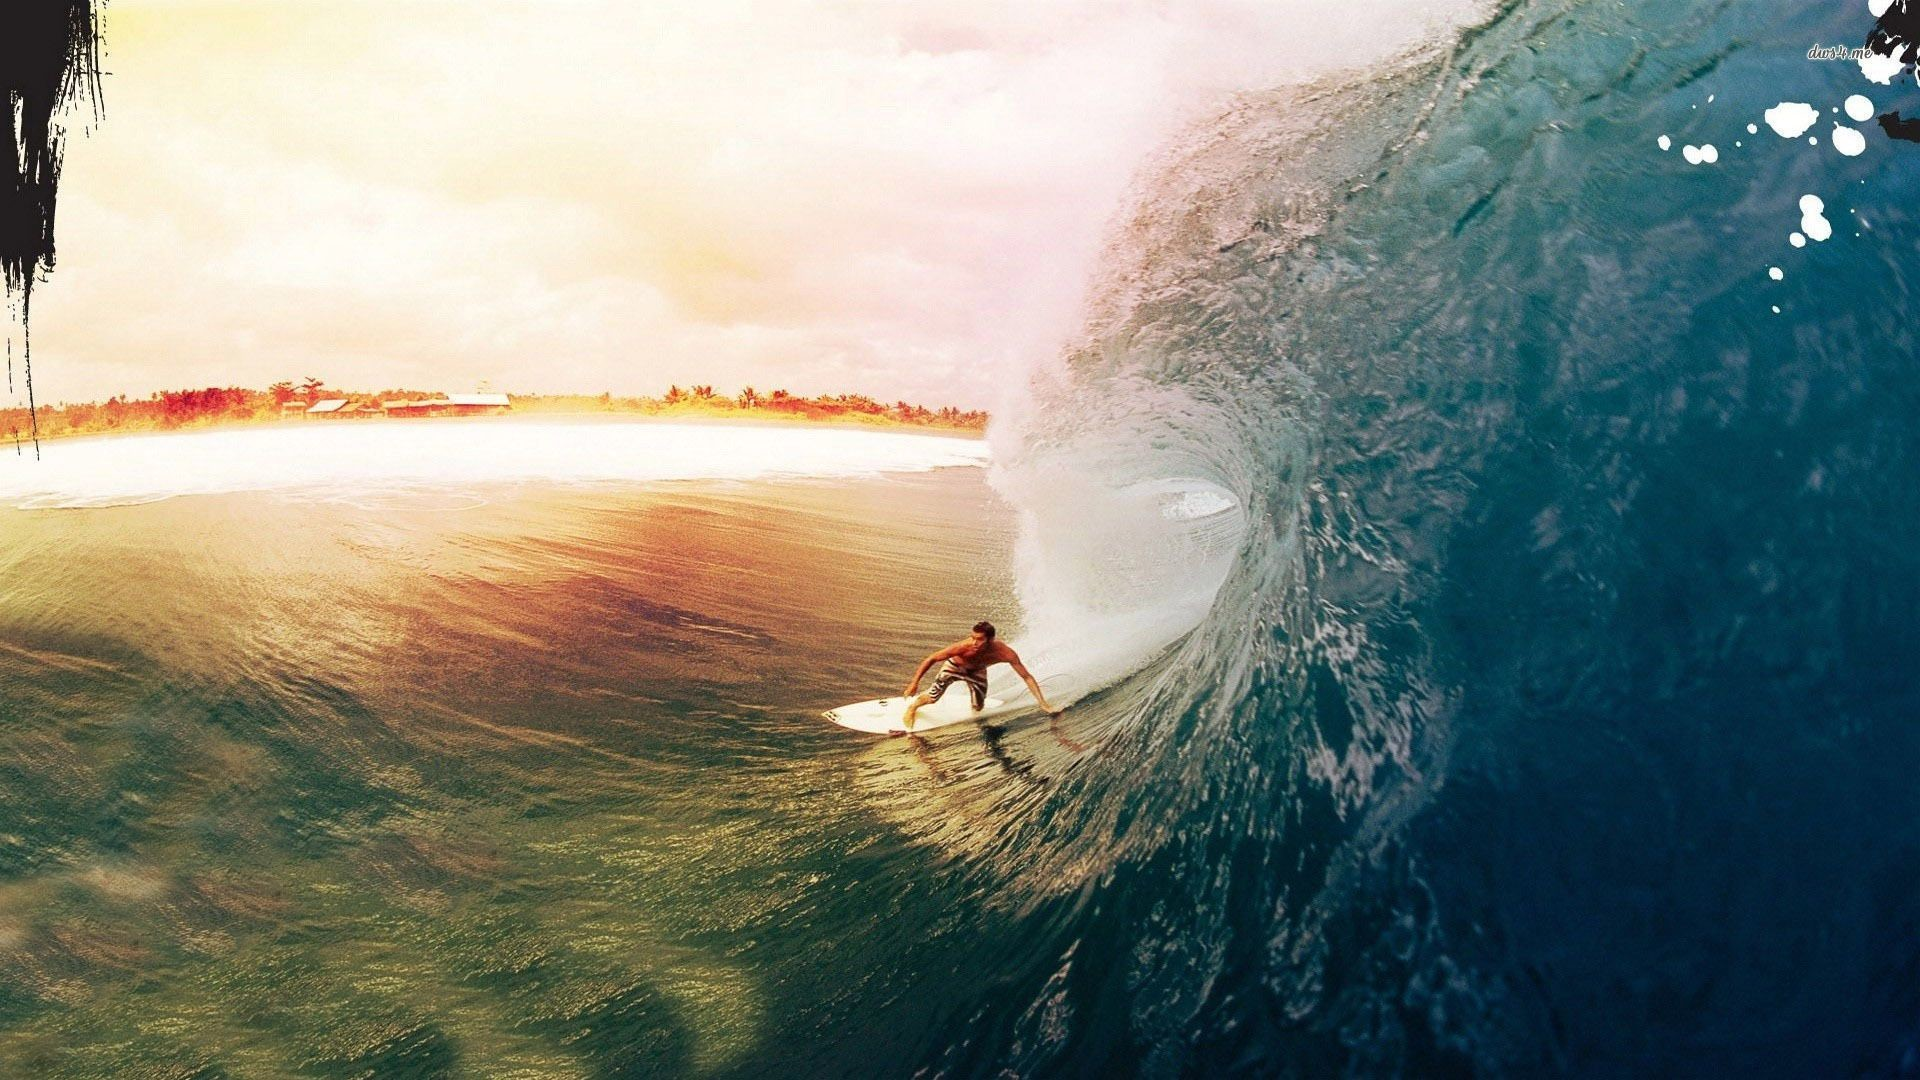 Surfer wallpaper – Sport wallpapers – #20230